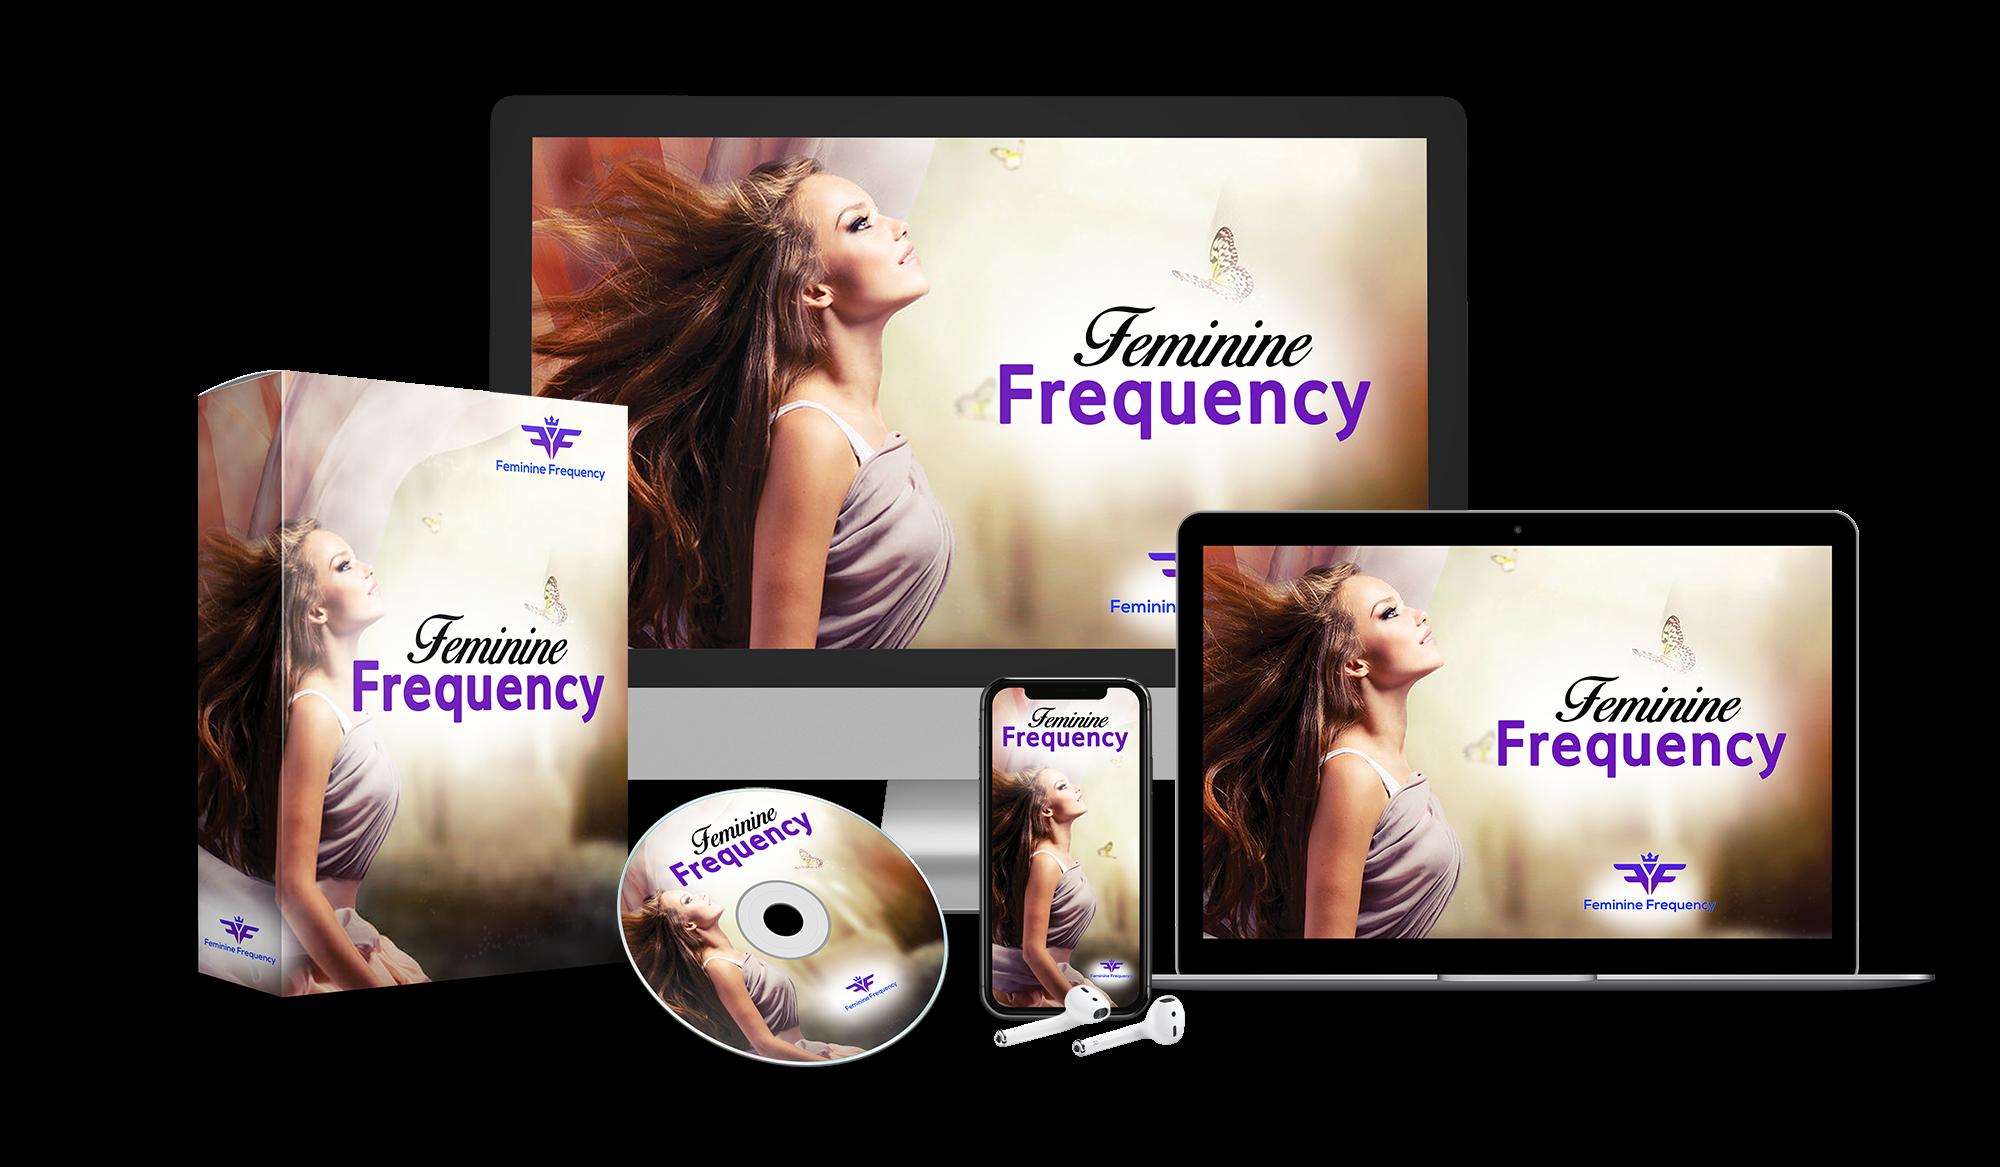 Feminine Frequency Program